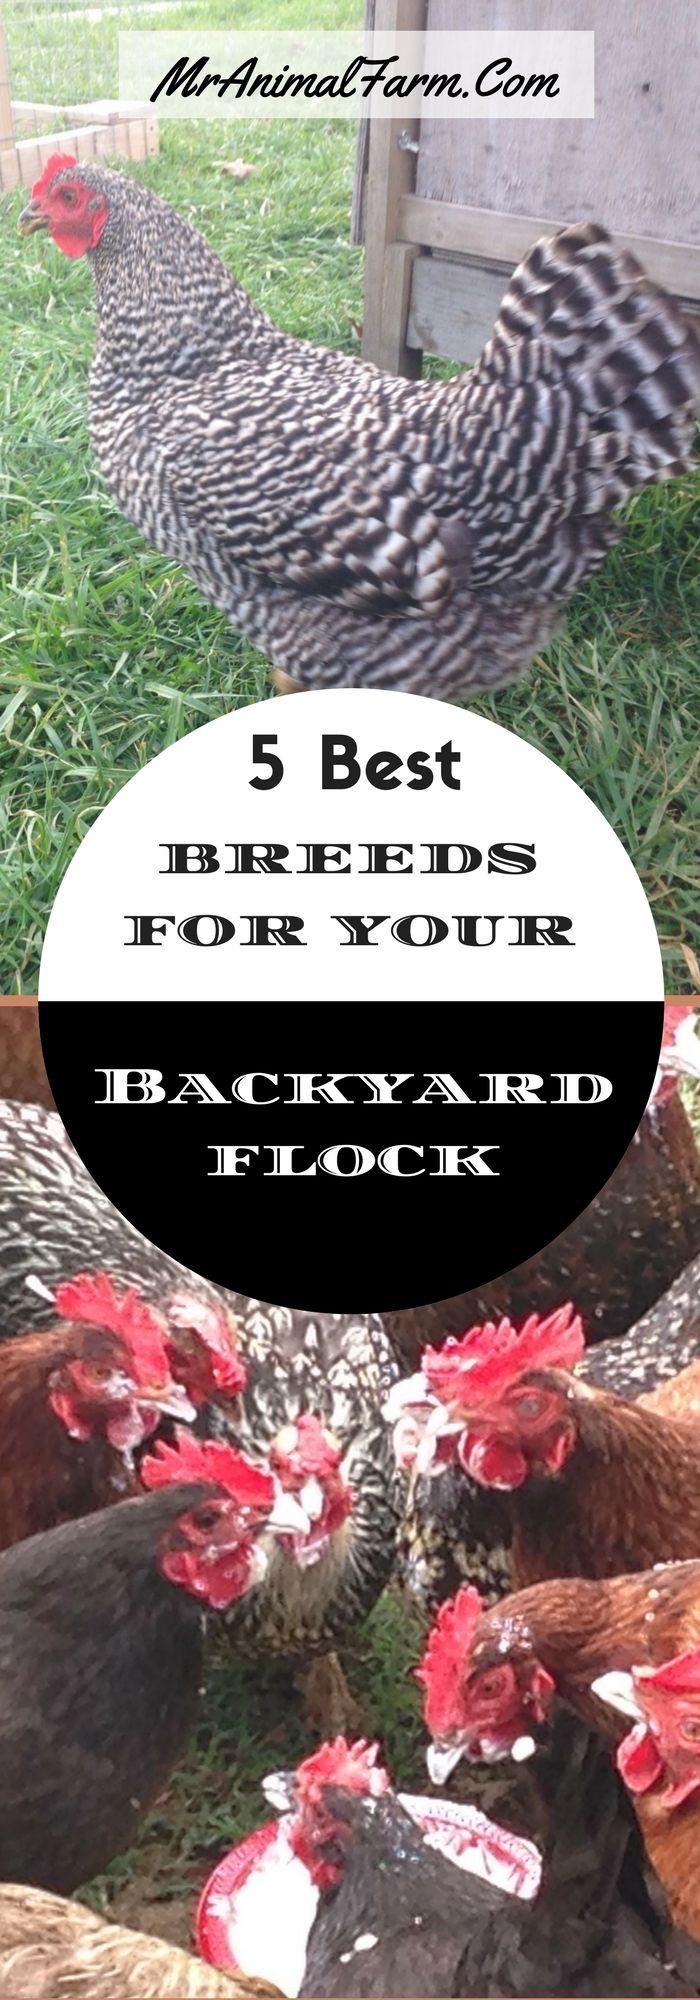 5 Best Breeds For Your Backyard Flock   EBook